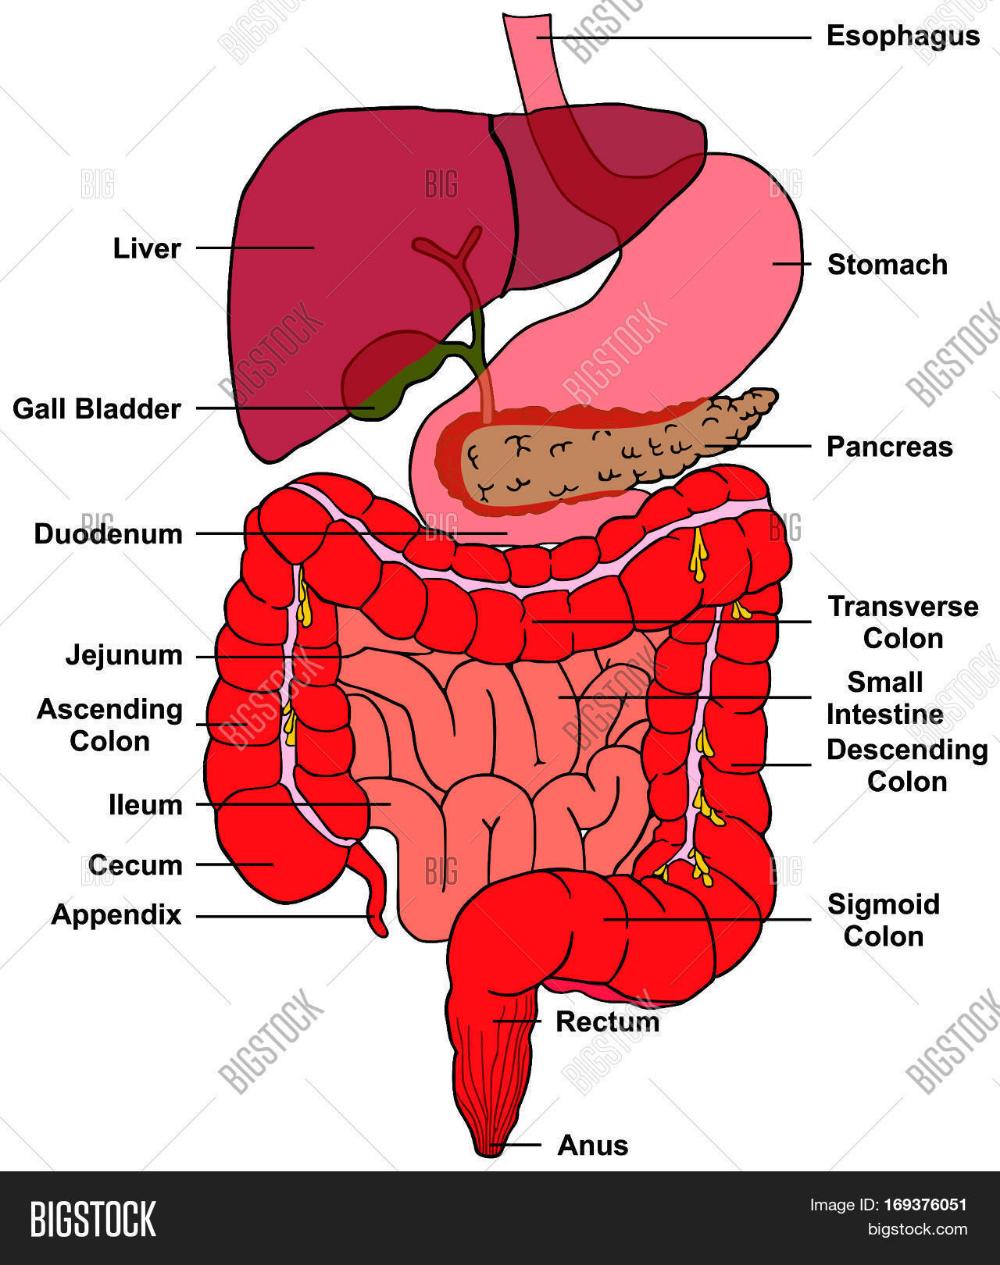 cecum location - Google Search | Liver detox, Liver health ...